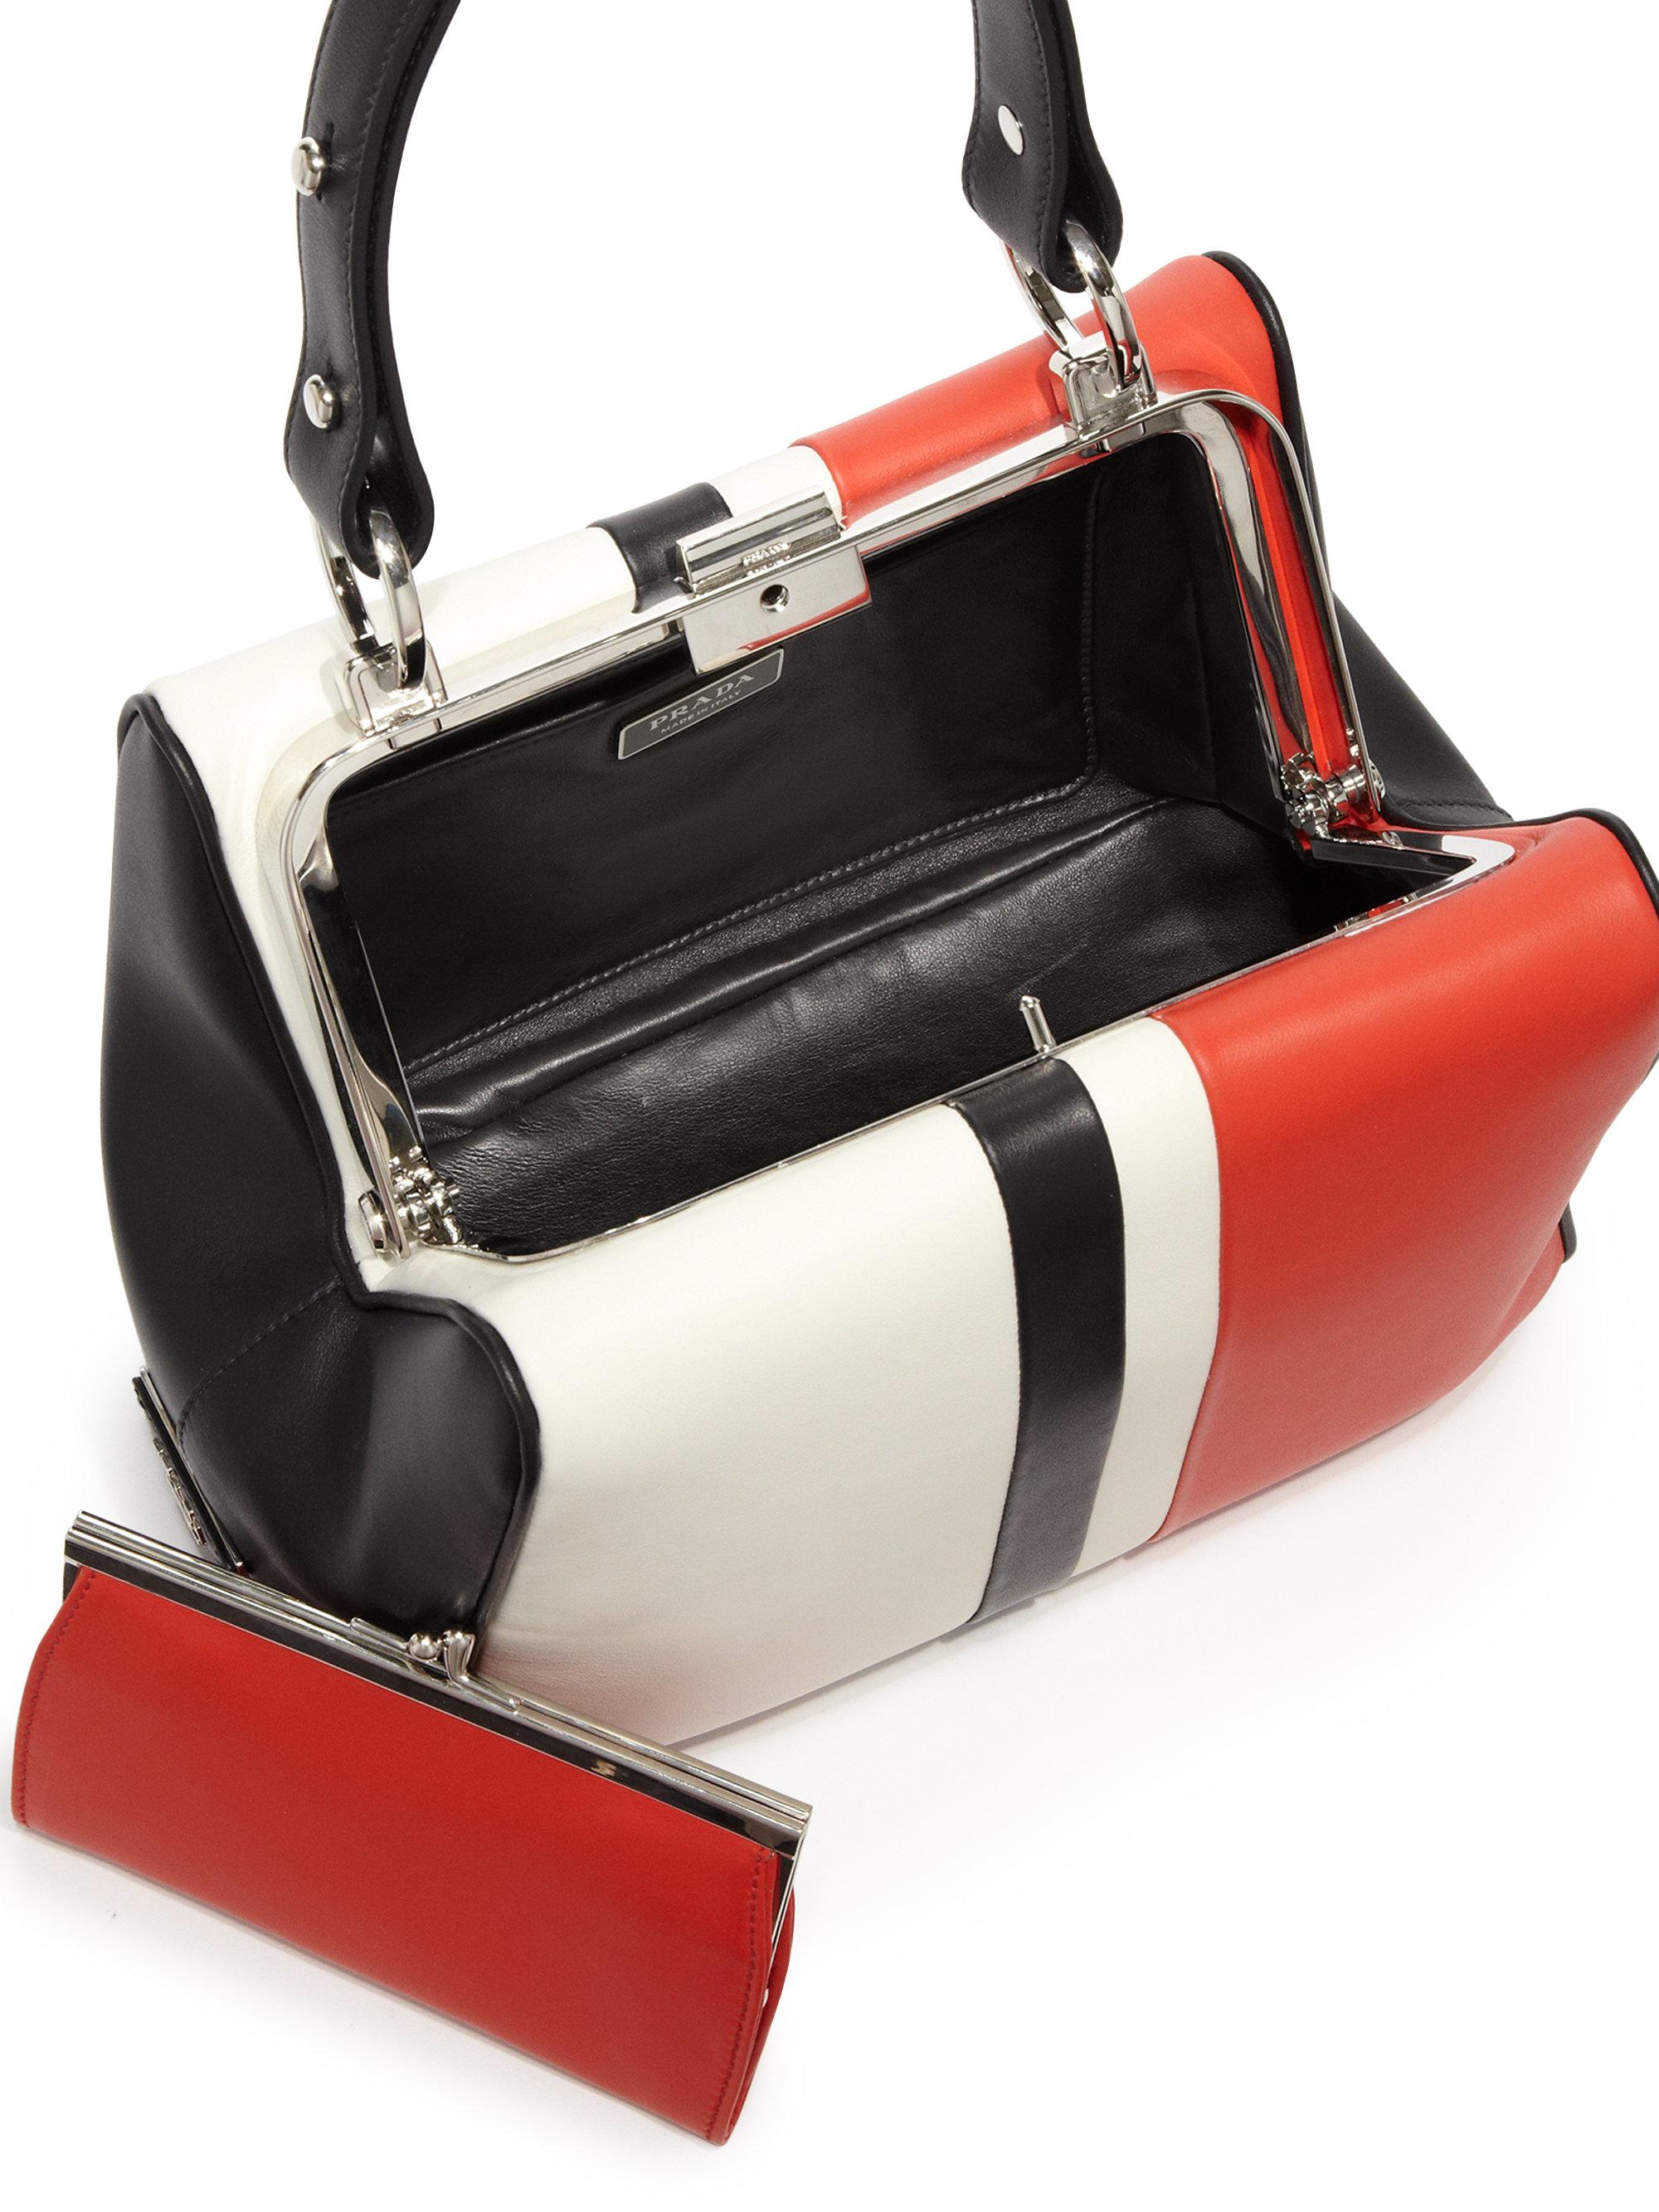 Prada Calf Baiadera Small Frame Bag in Black (white-red) | Lyst